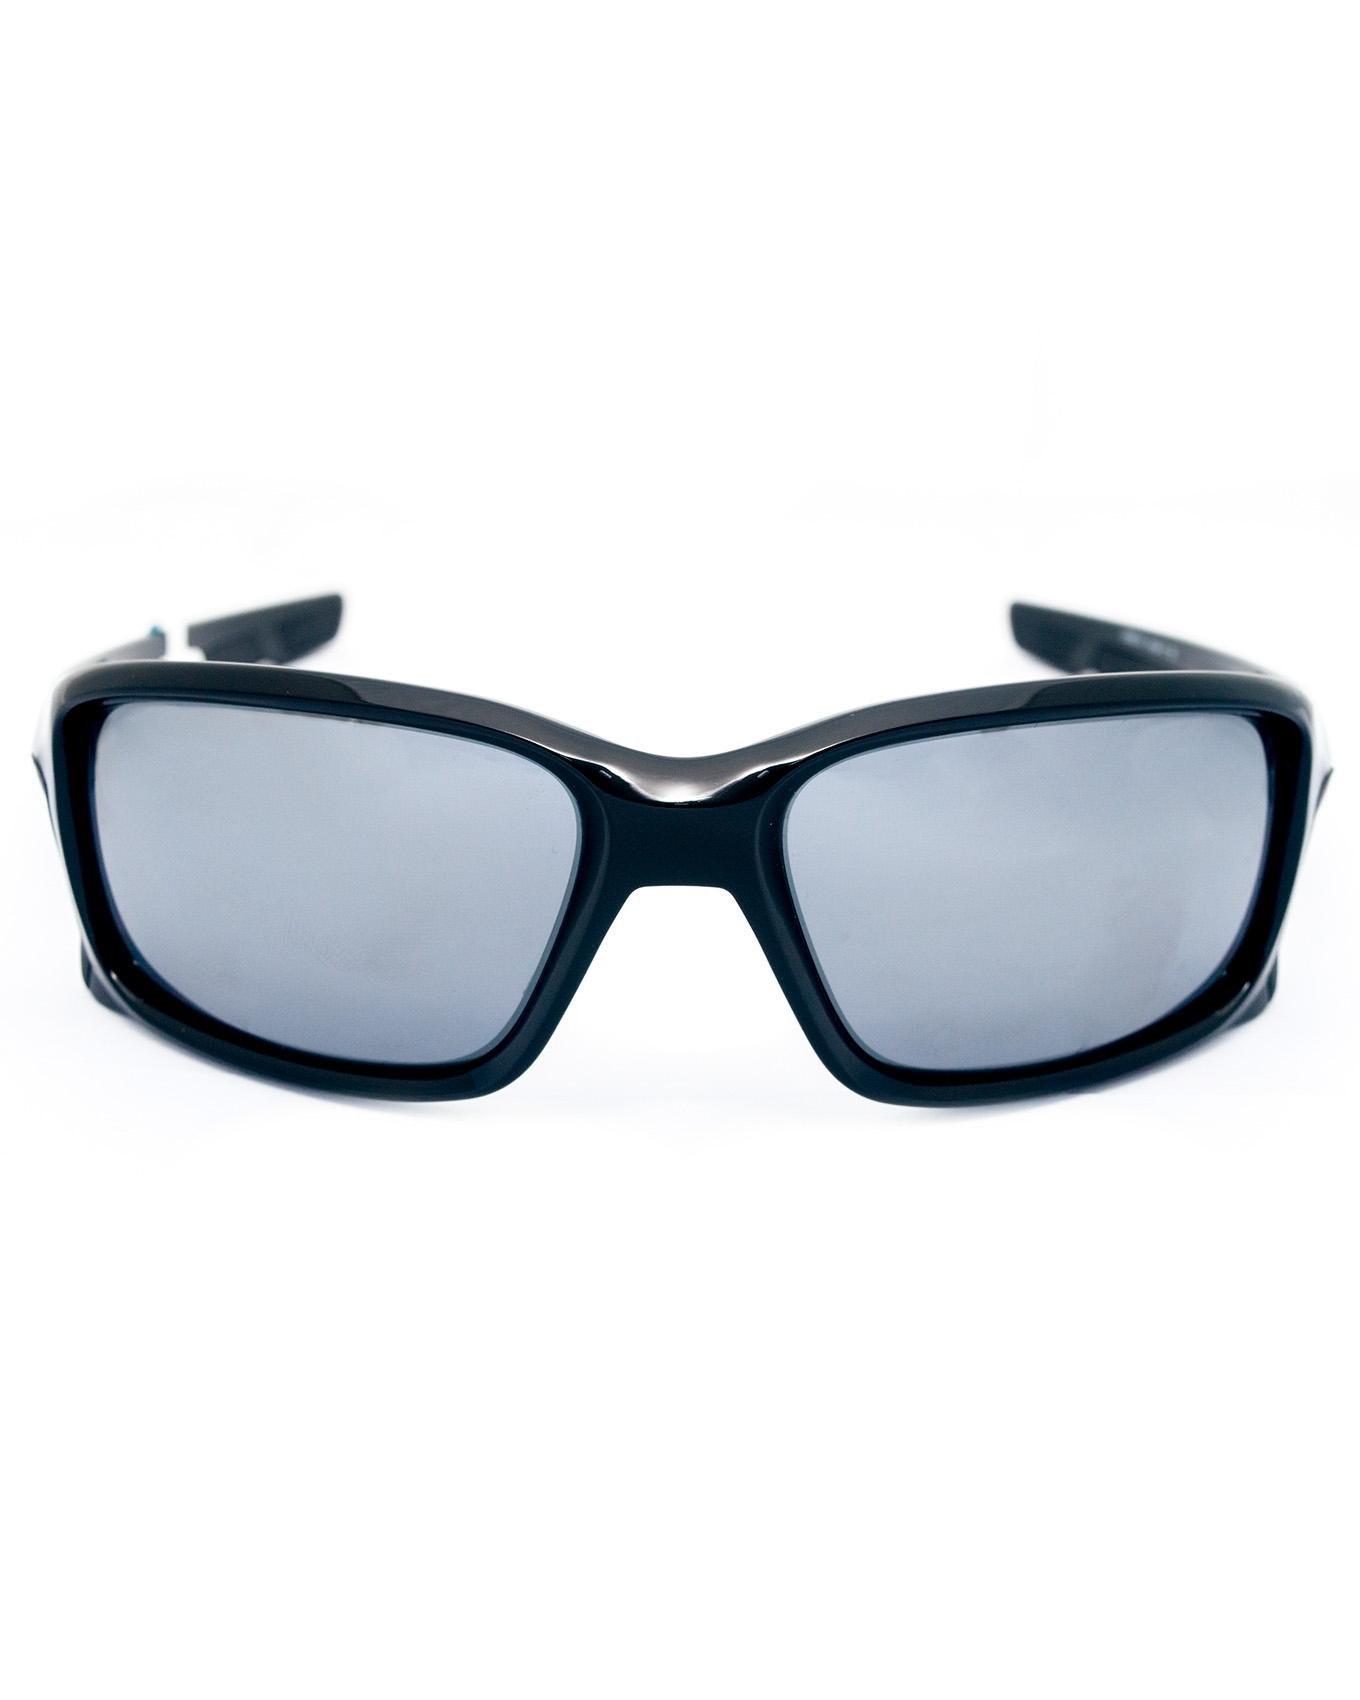 8919d318dea Buy Oakley mens sunglasses at Best Prices Online in Sri Lanka - daraz.lk